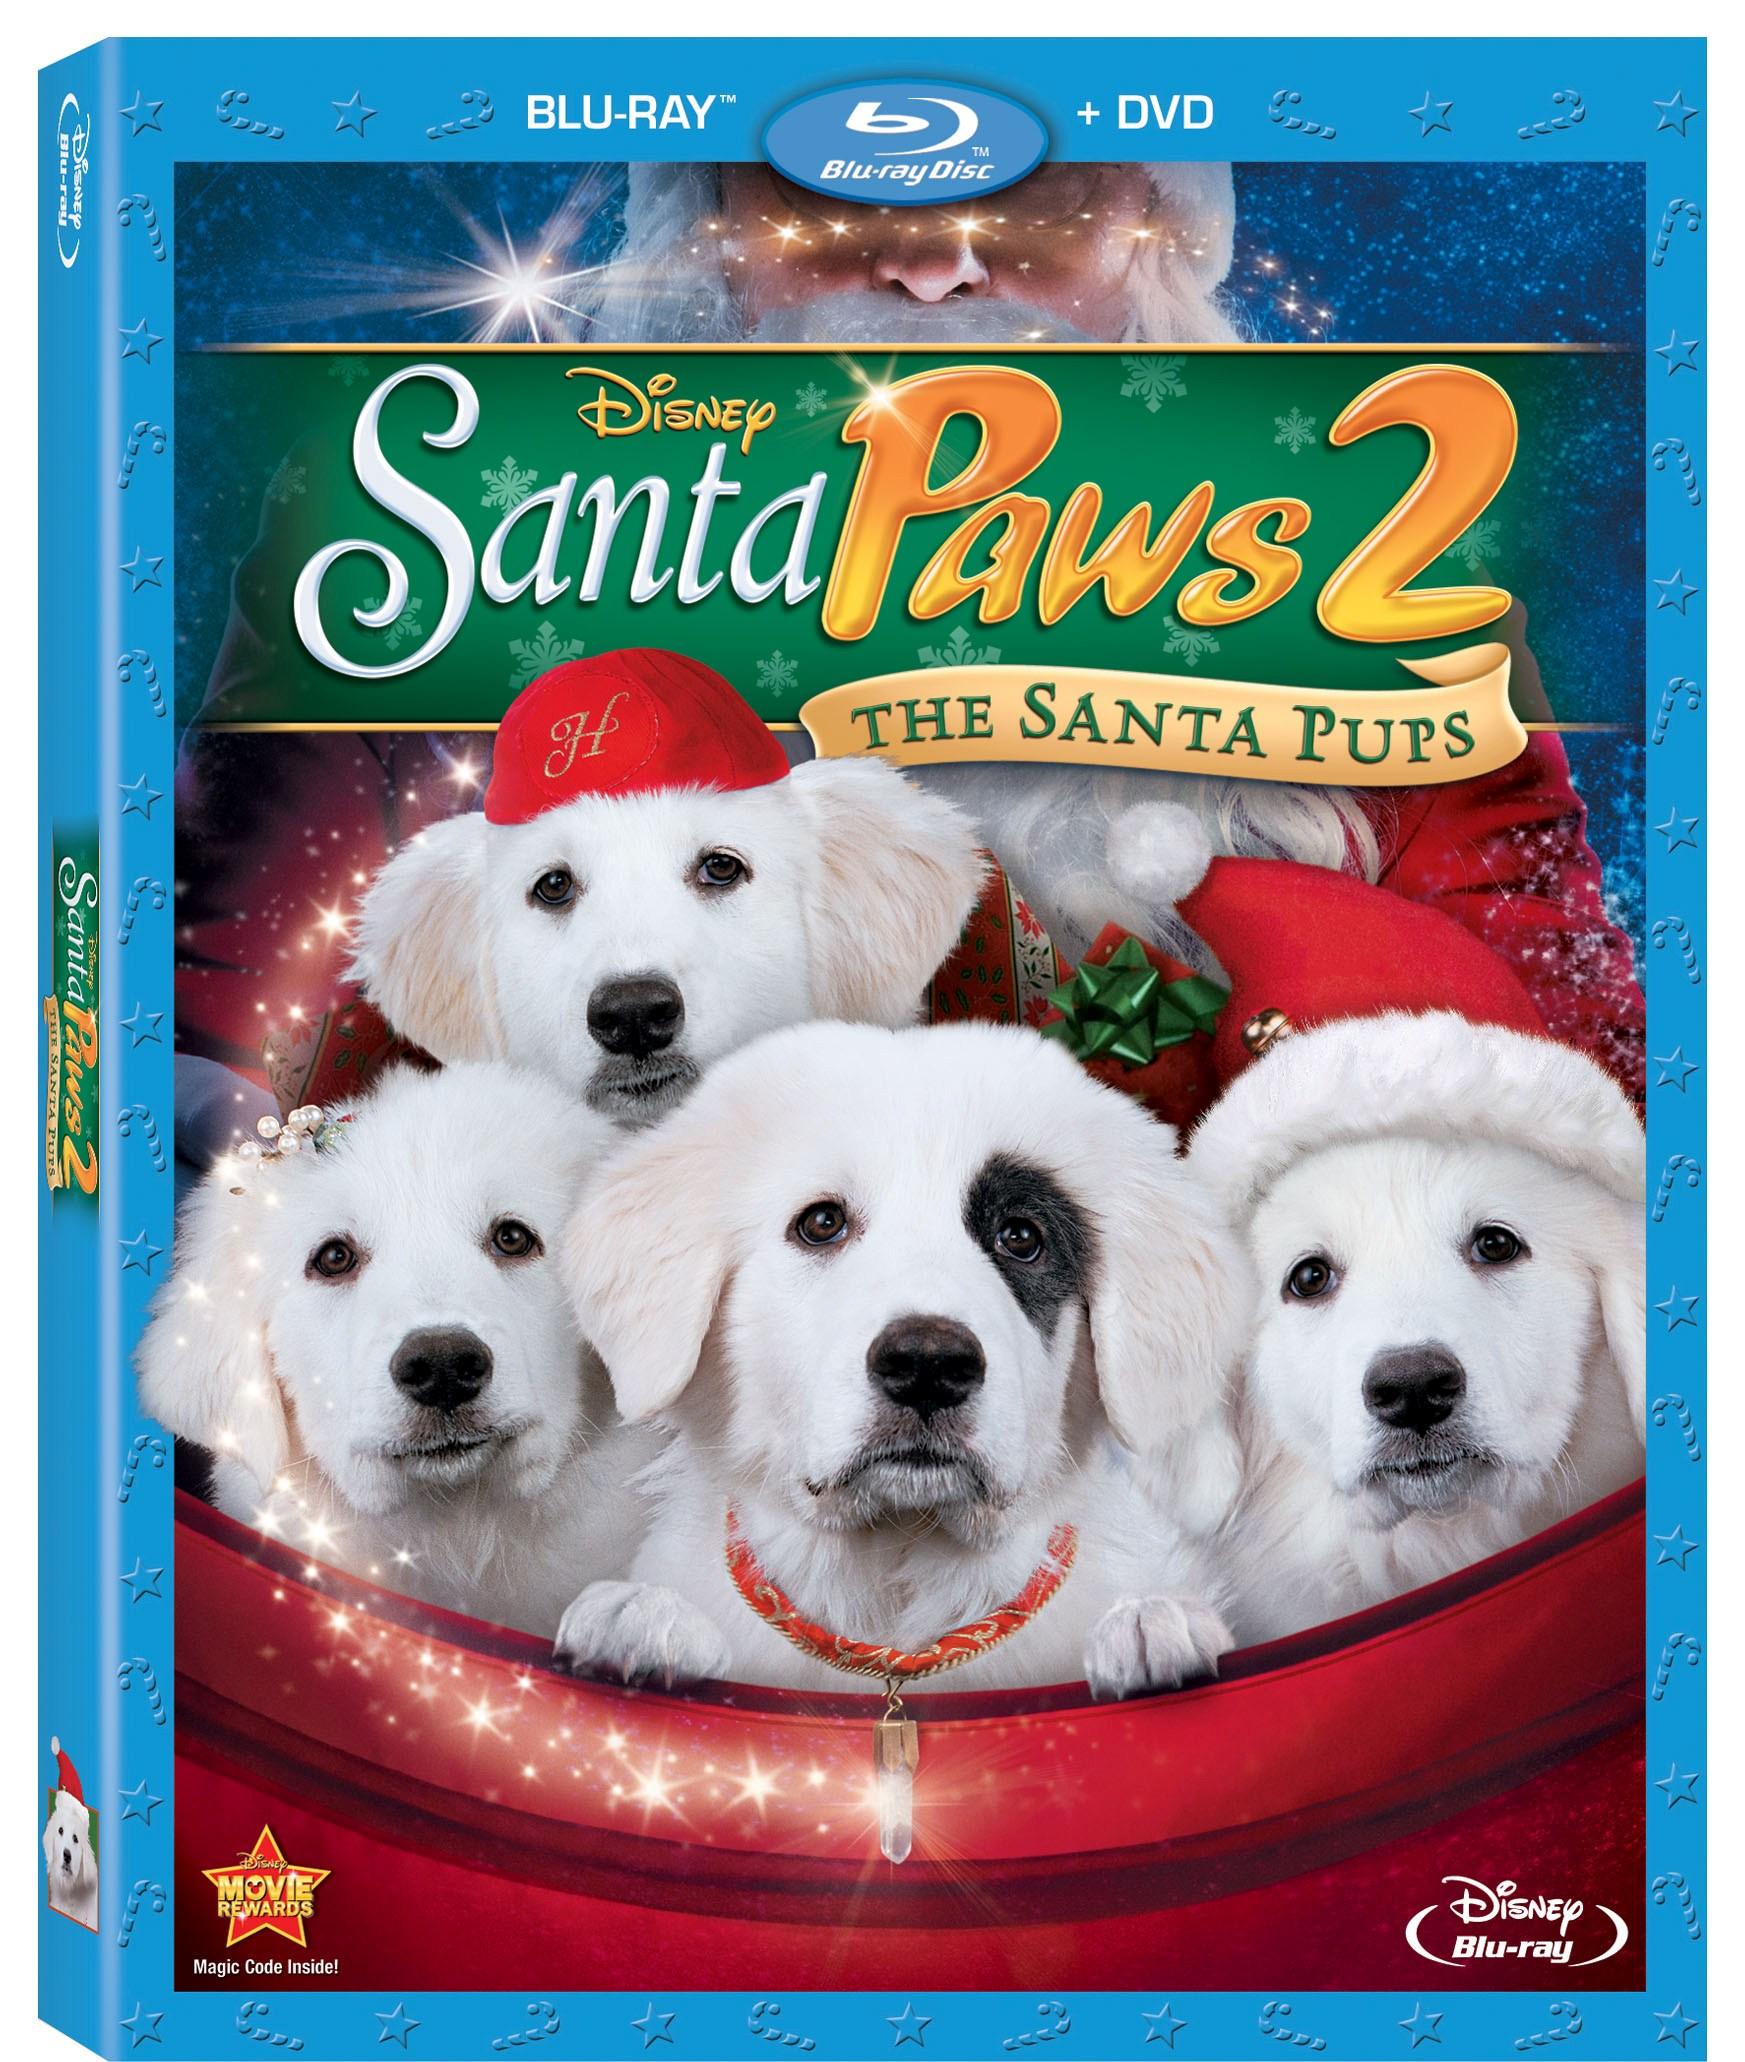 Disney's Santa Paws 2 The Santa Pups Blueray / DVD Giveaway